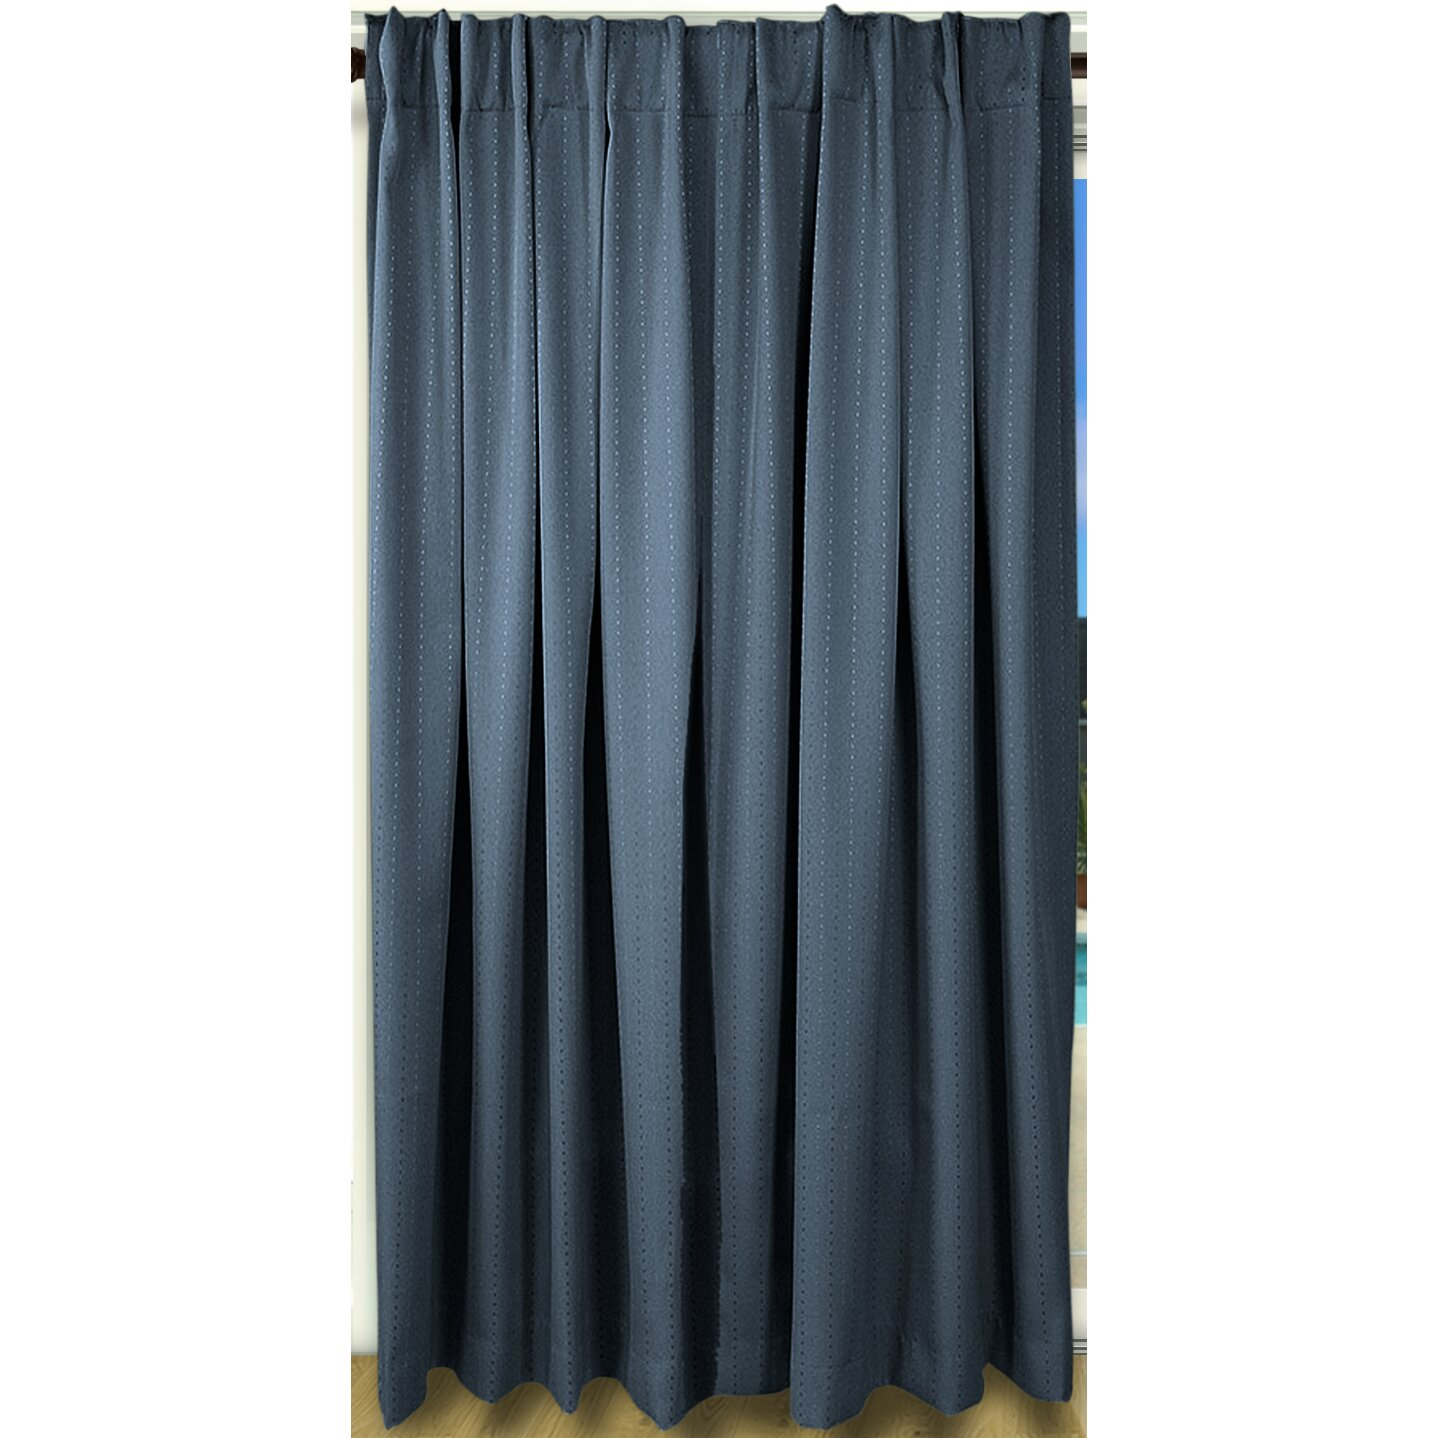 Brayden Studio Louie Back Tab Rod Pocket Patio Blackout Single Curtain Panel Reviews Wayfair